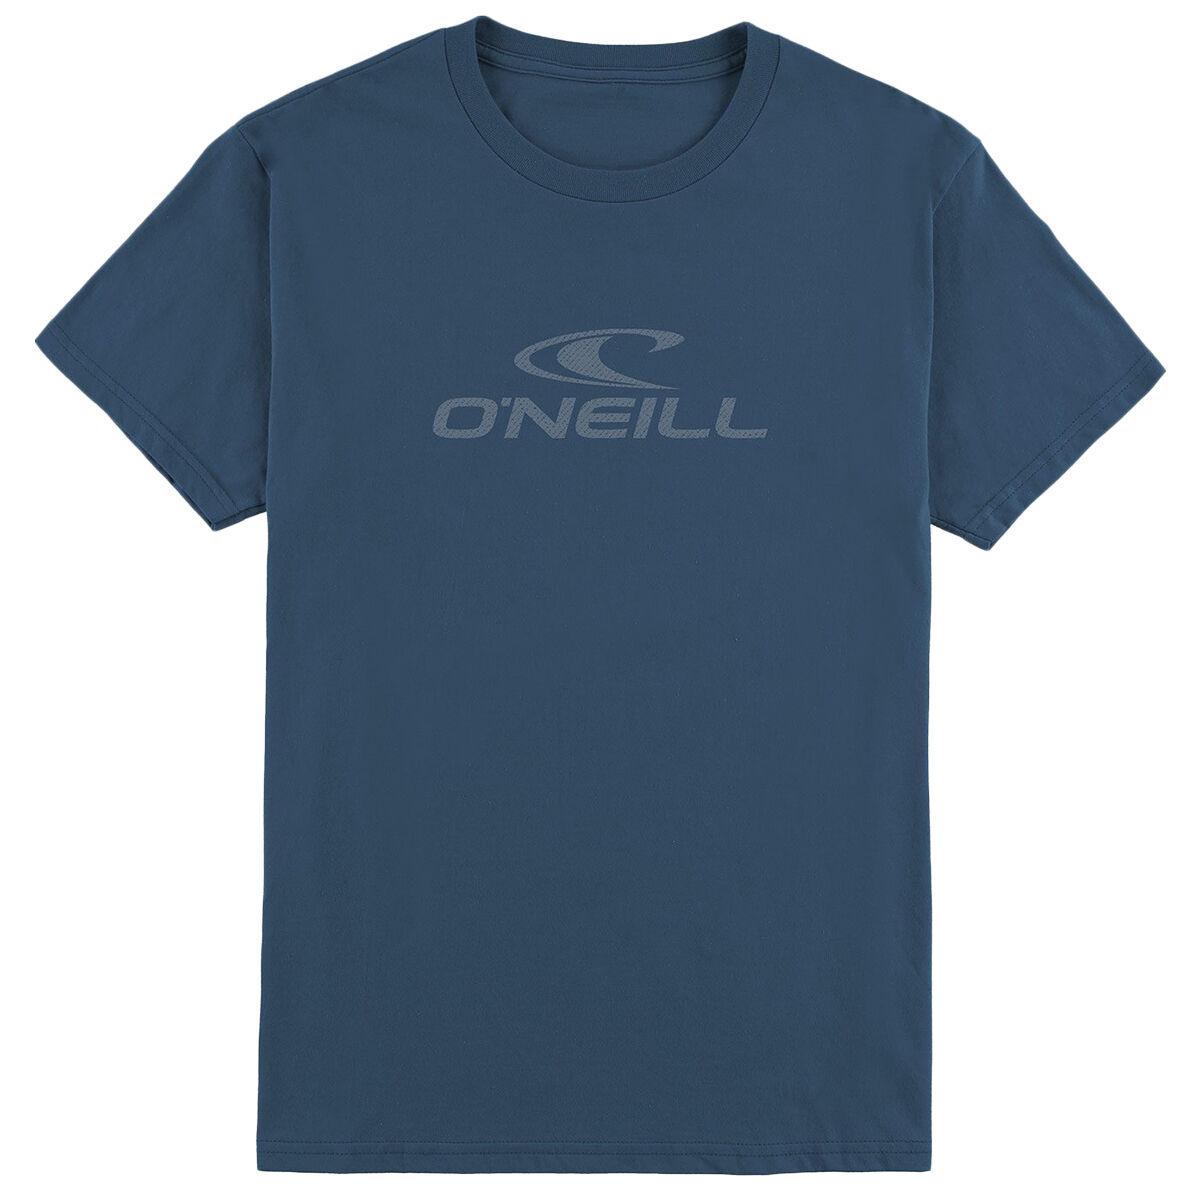 O'neill Men's Supreme Short-Sleeve Tee - Blue, S